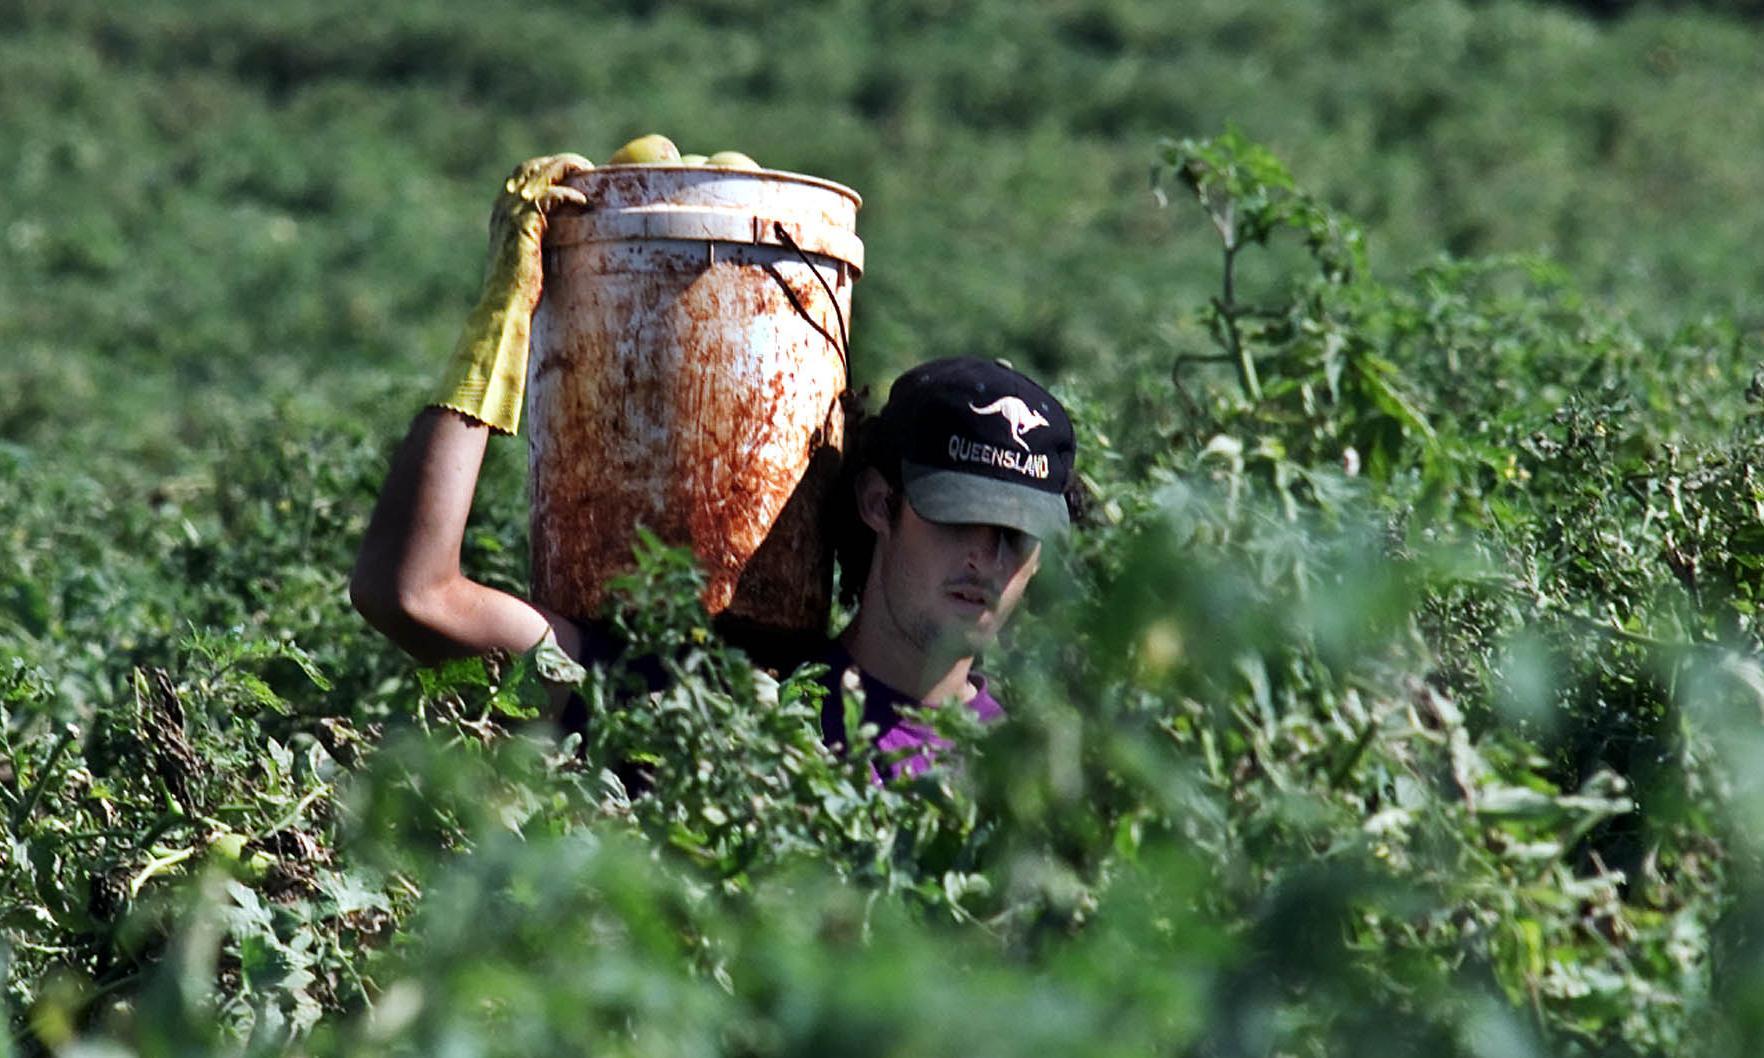 #88daysaslave: backpackers share stories of farm work exploitation